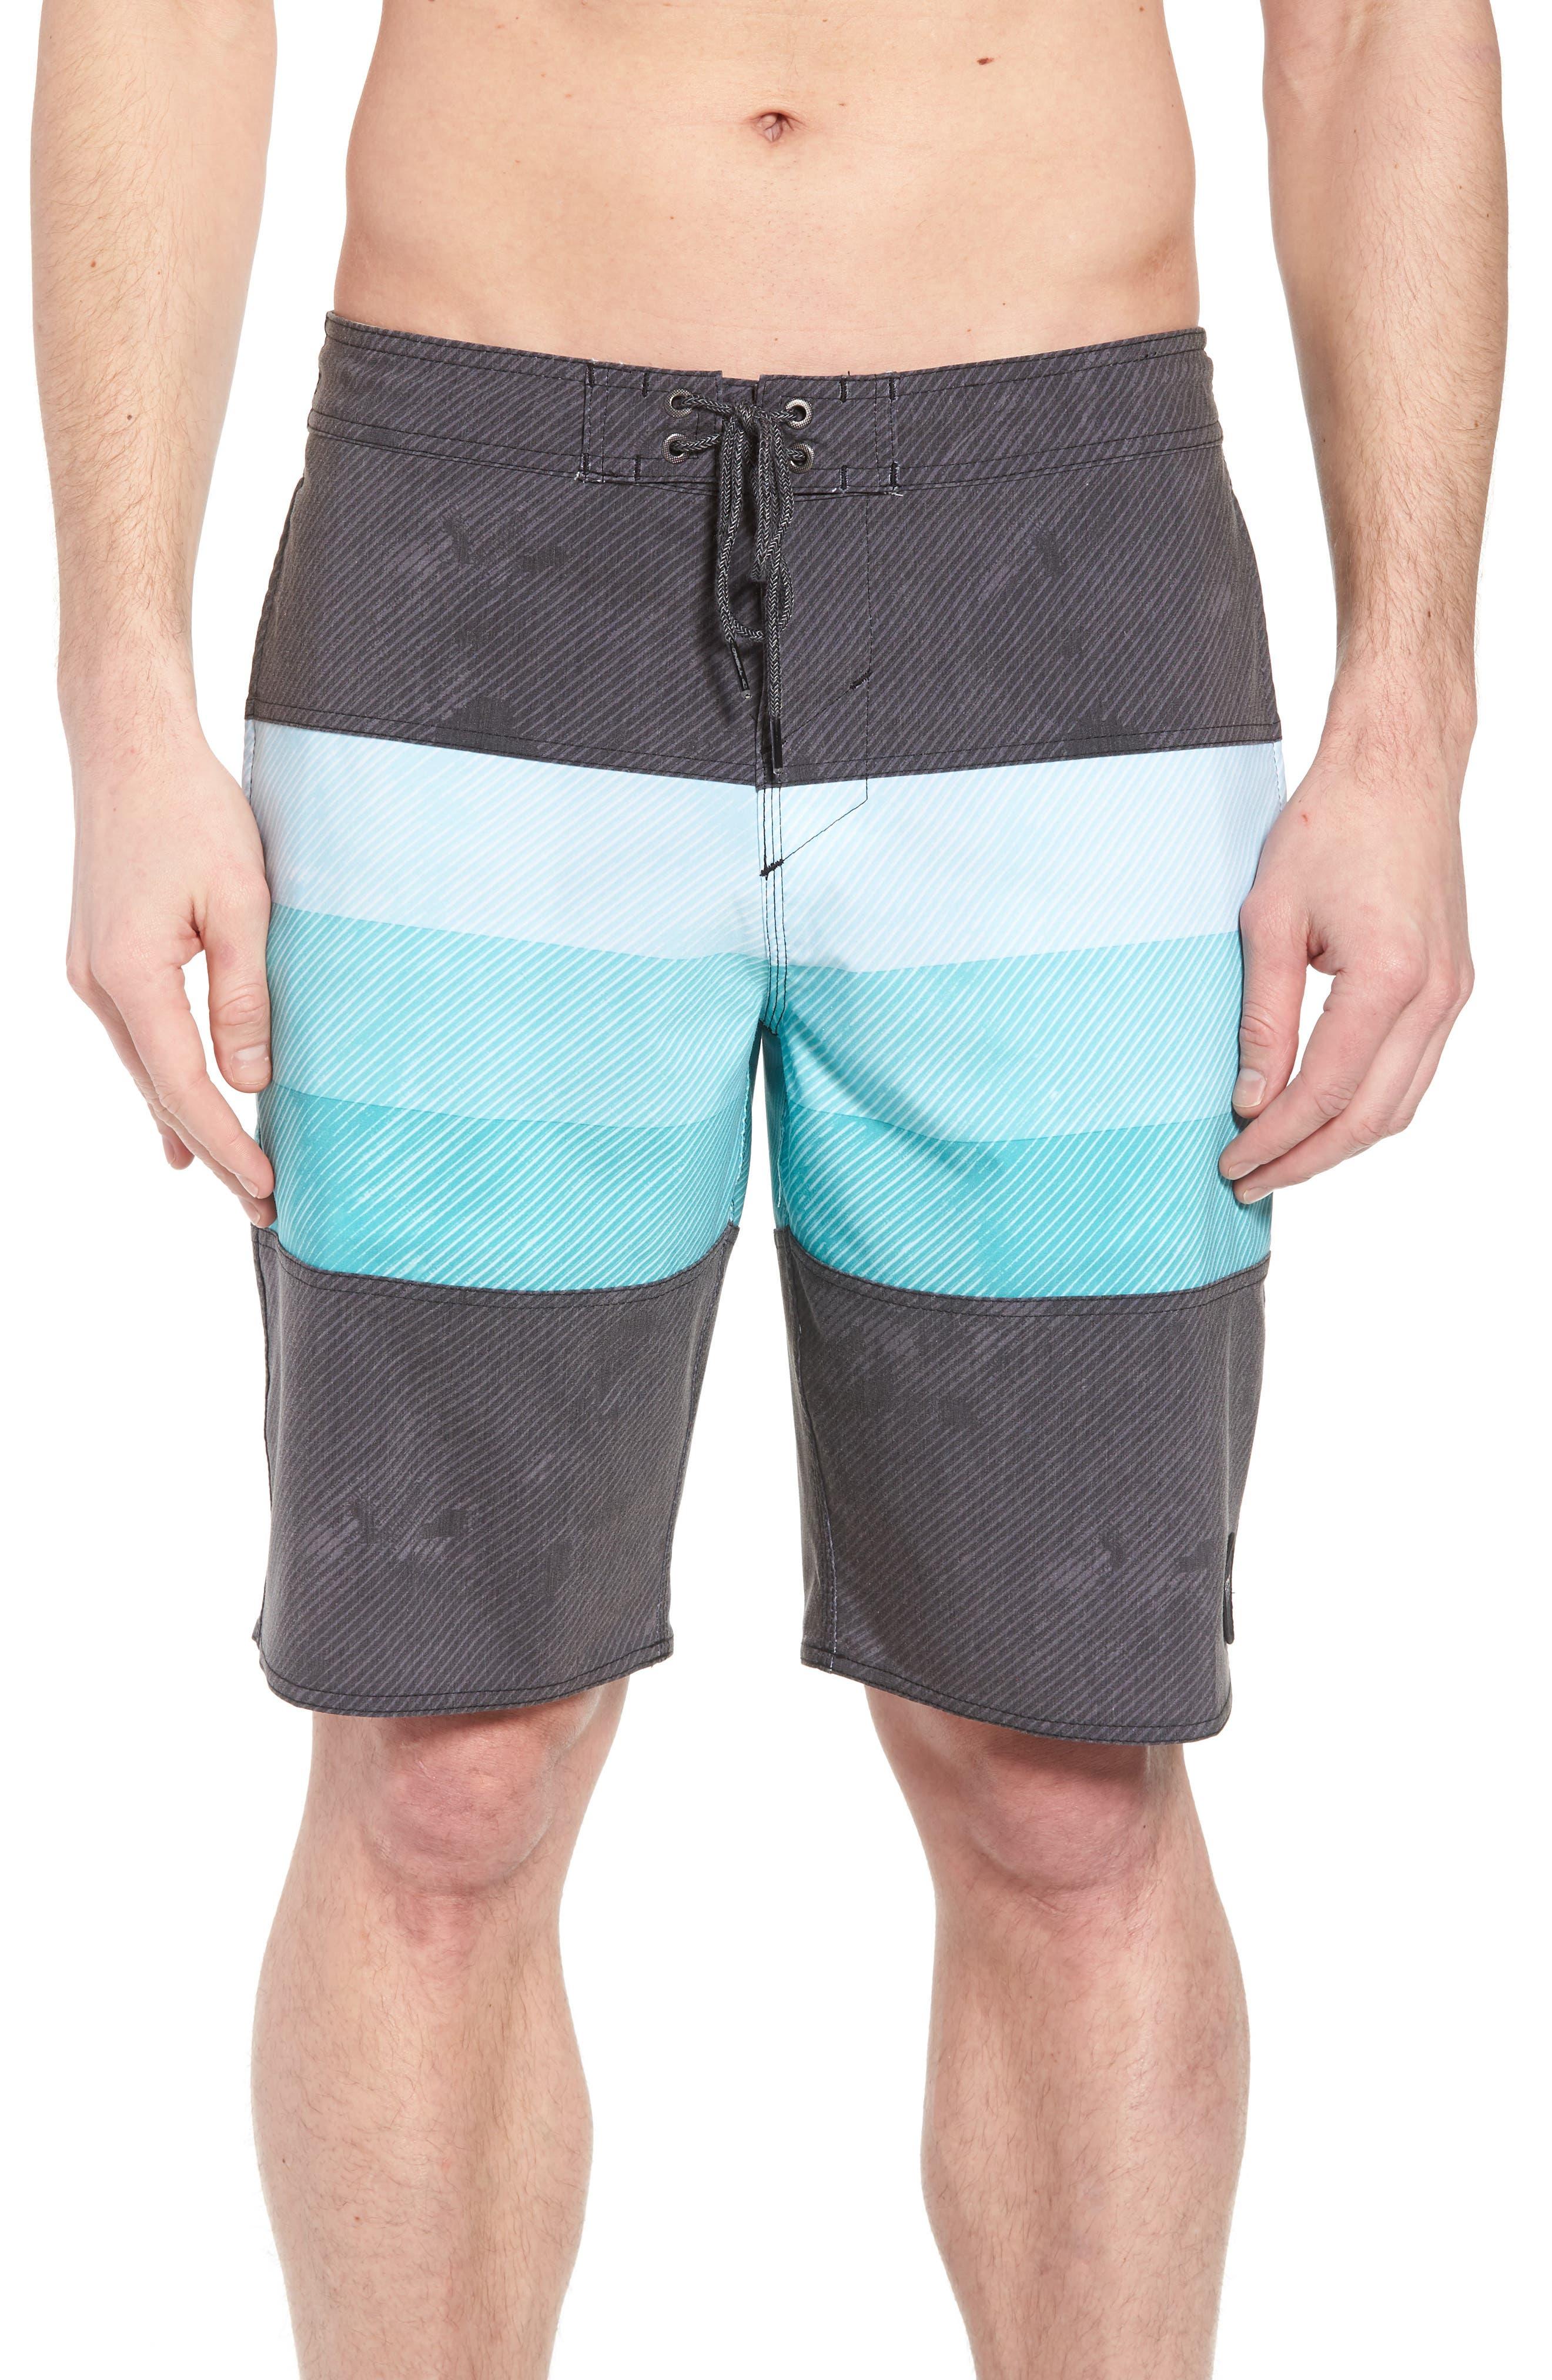 Region Cruzer Board Shorts,                         Main,                         color, Black